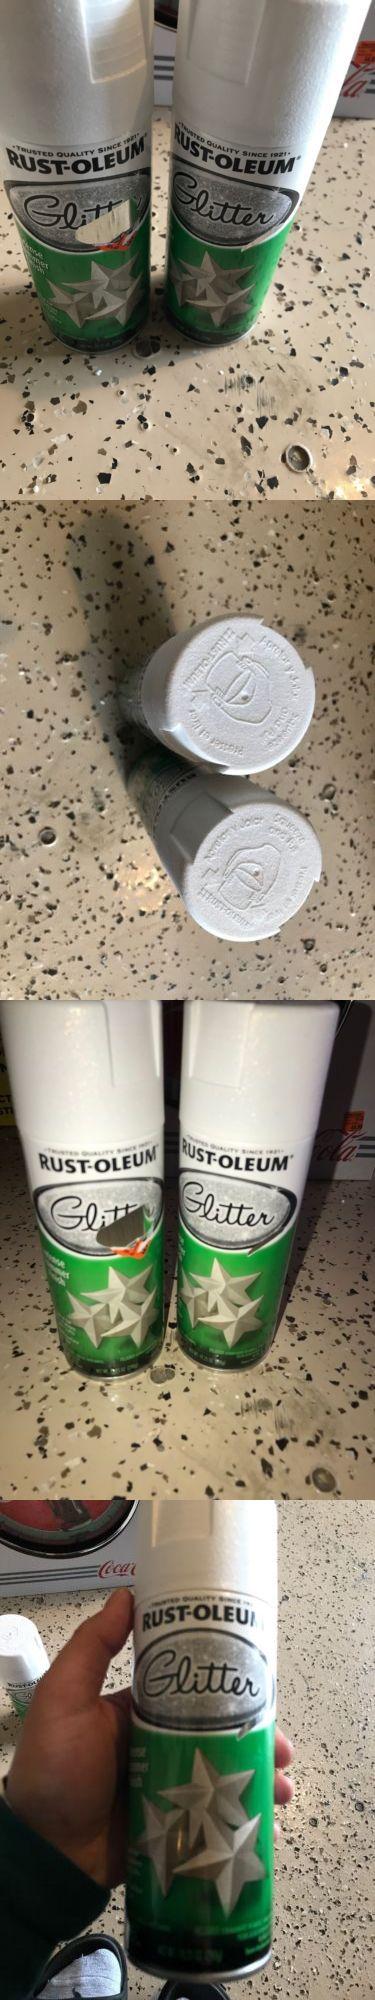 Spray Paint 183104: 2 Rust-Oleum Specialty Glitter Spray